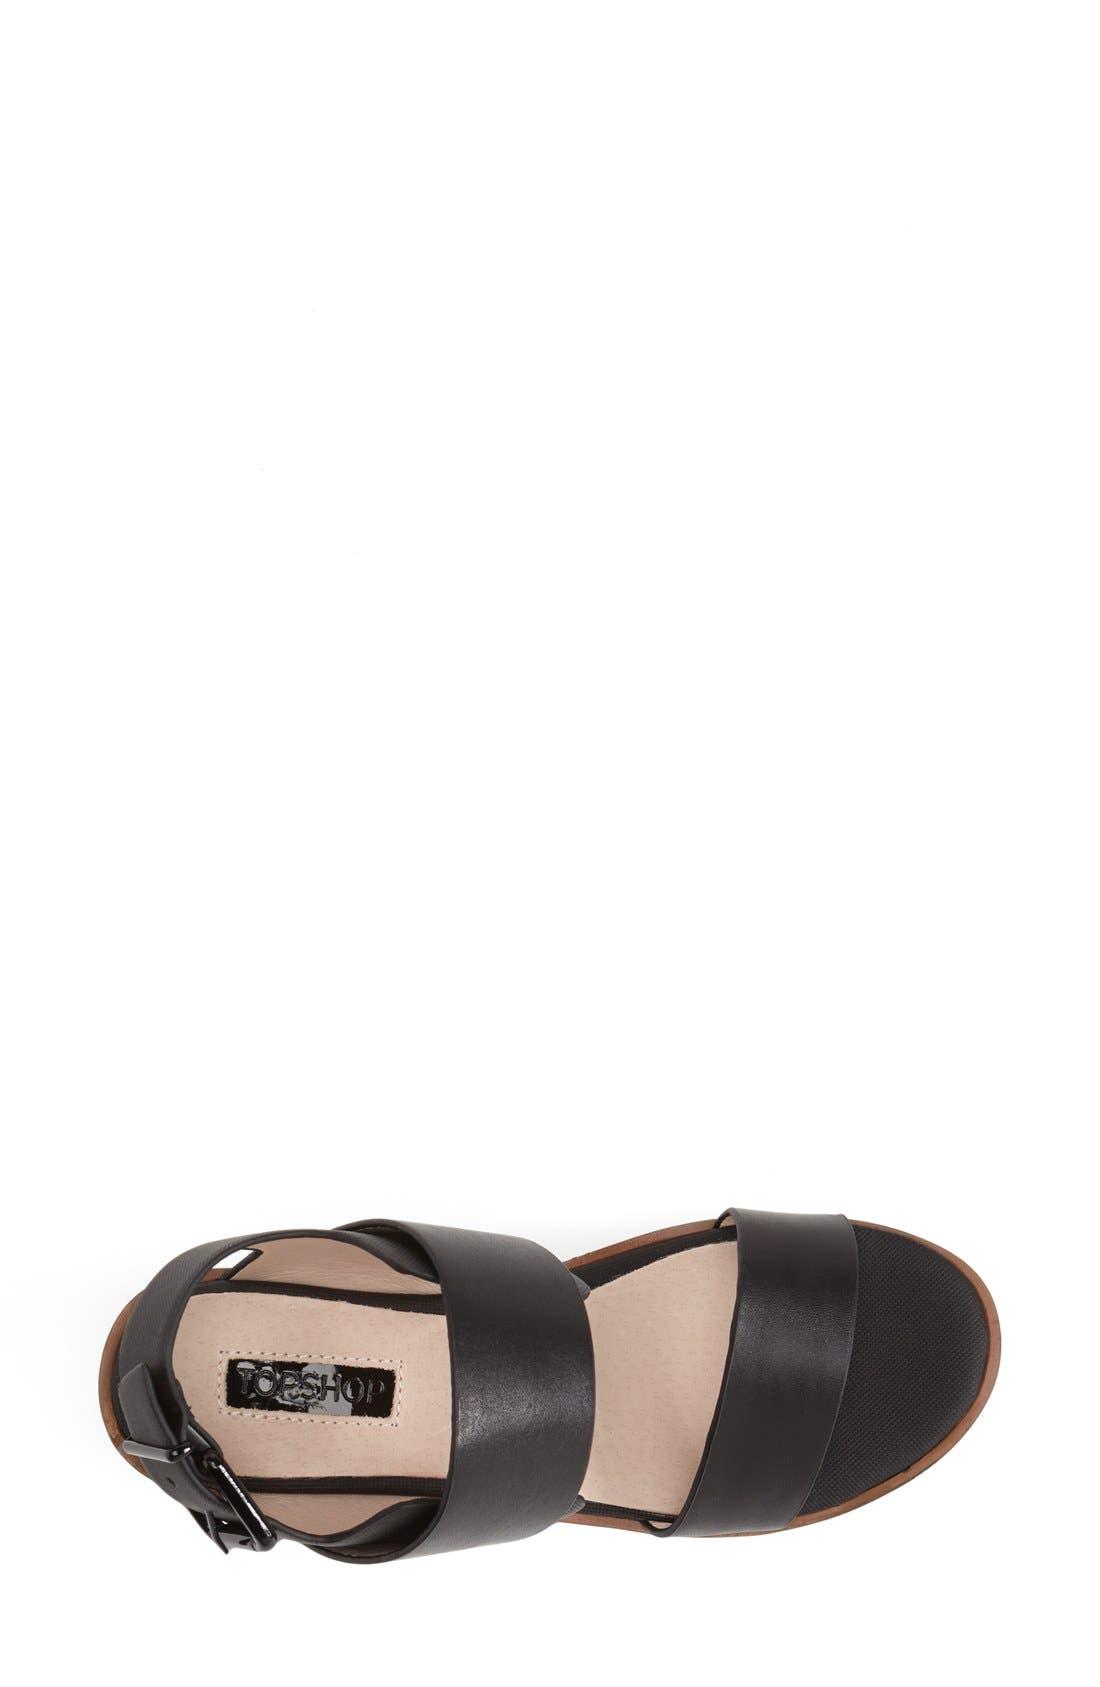 Alternate Image 3  - Topshop 'Ninja' Platform Sandal (Women)